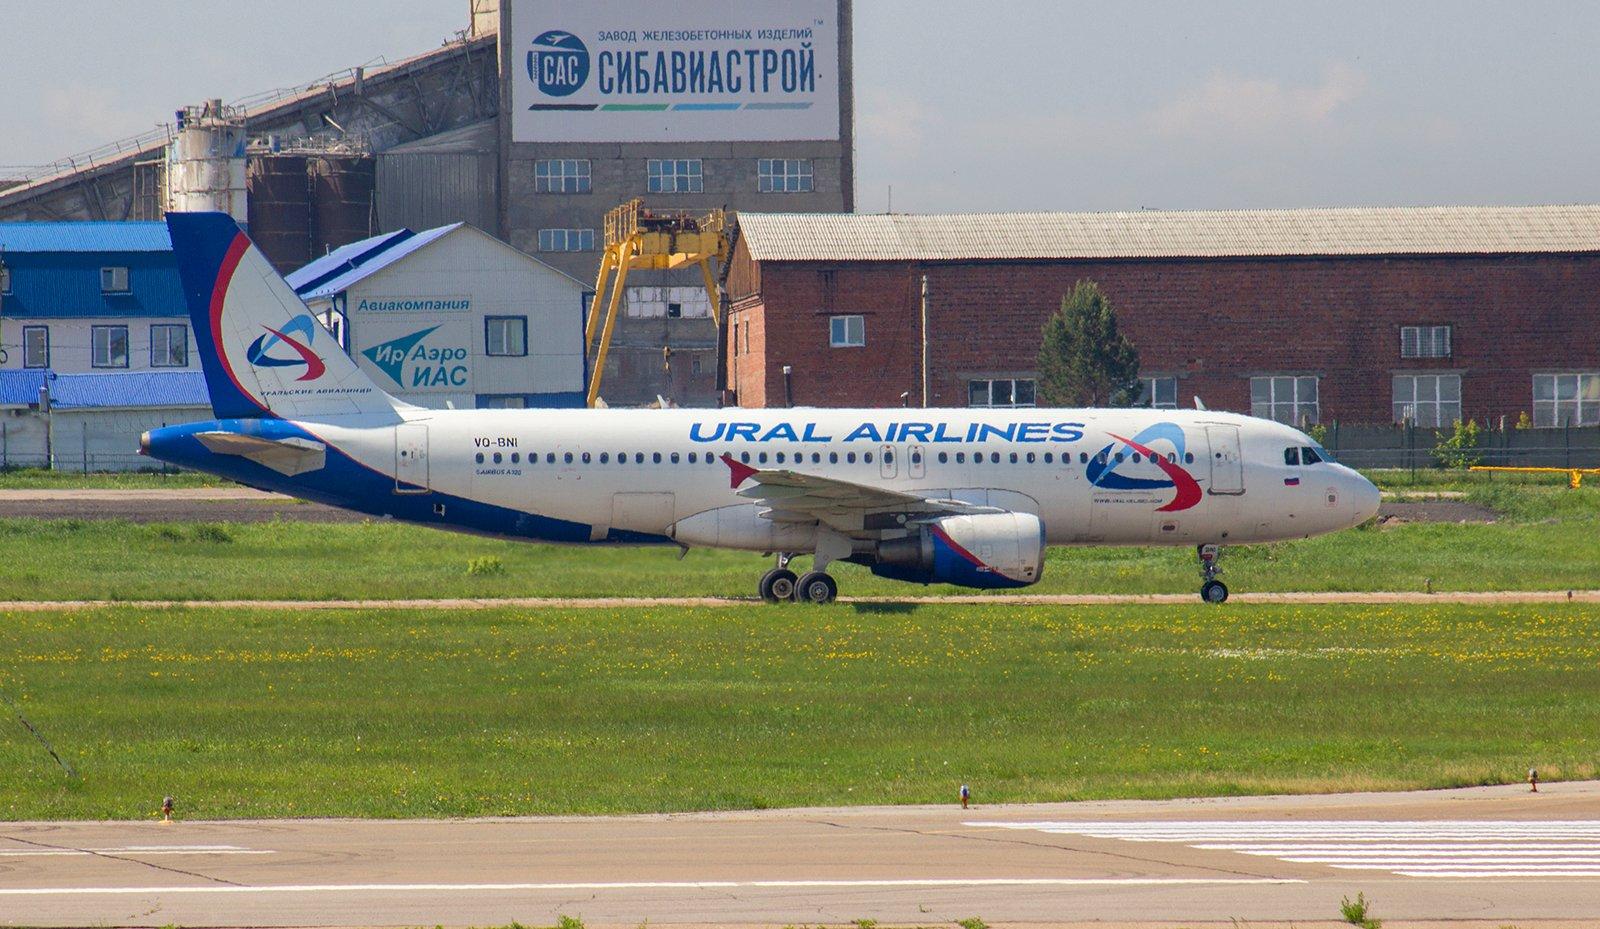 Авиалайнер Airbus А320 VQ-BNI Уральских авиалиний в аэропорту Иркутска